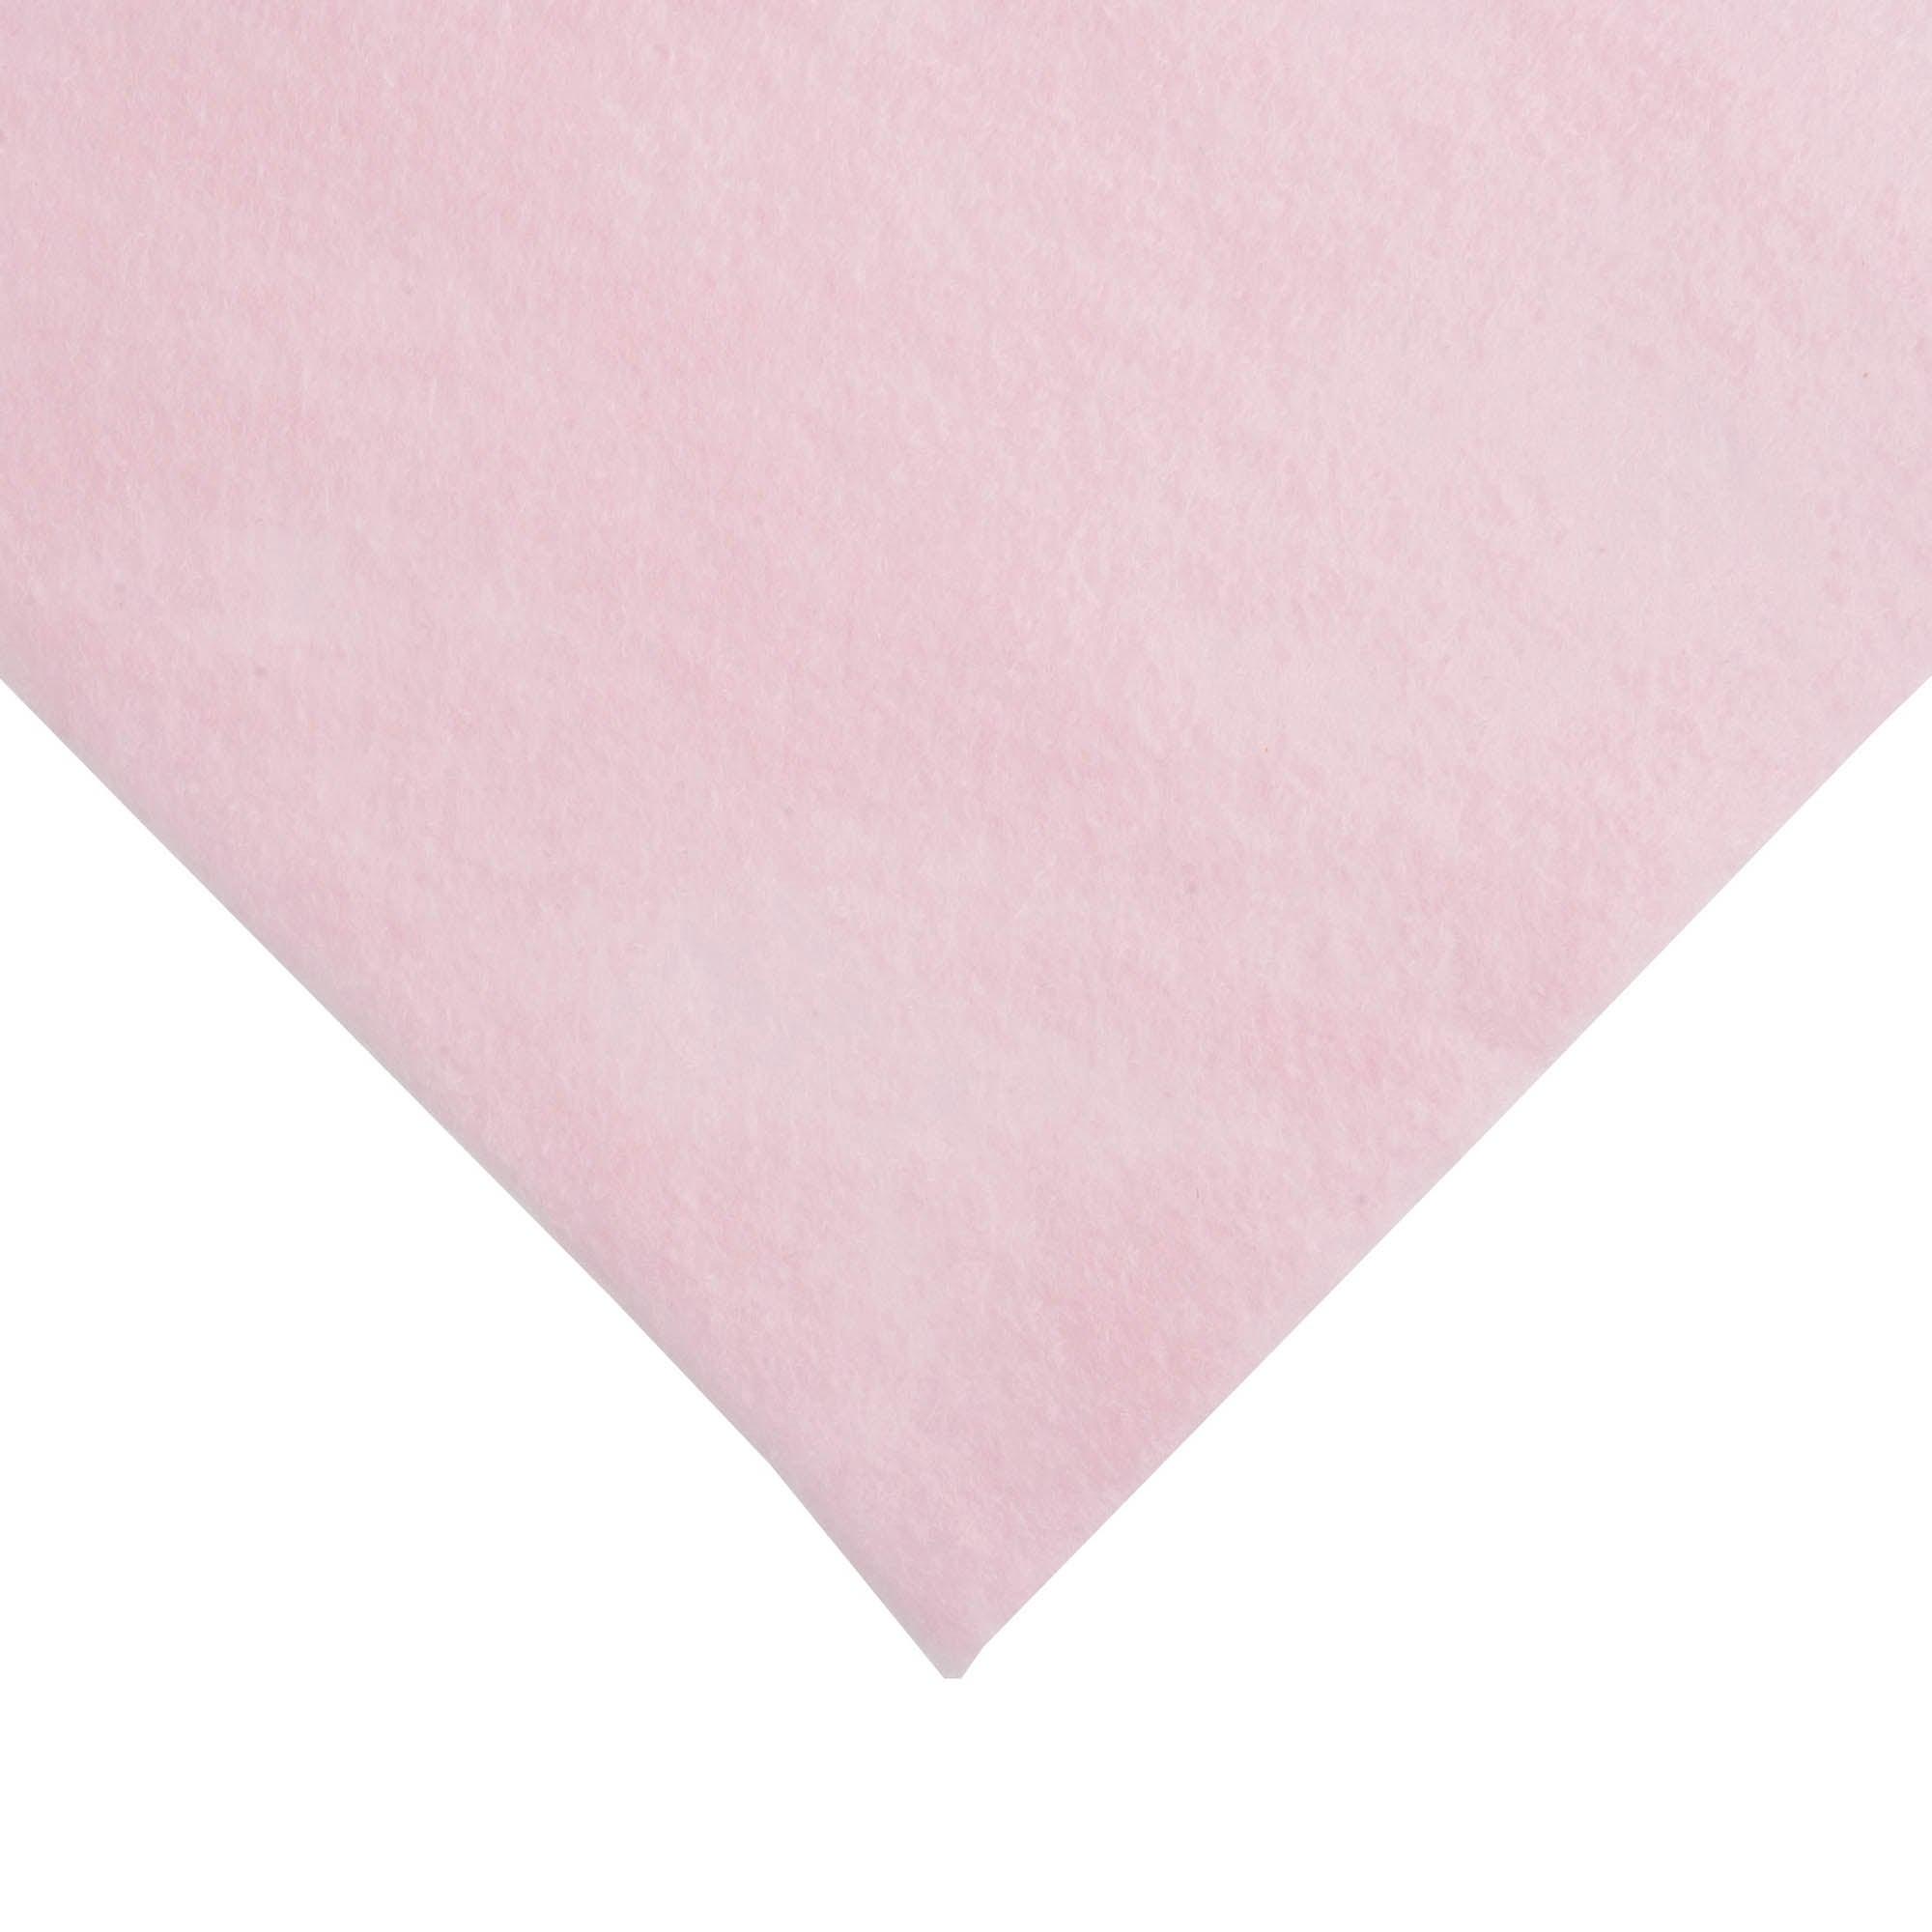 Photo of Minicraft felt roll pink